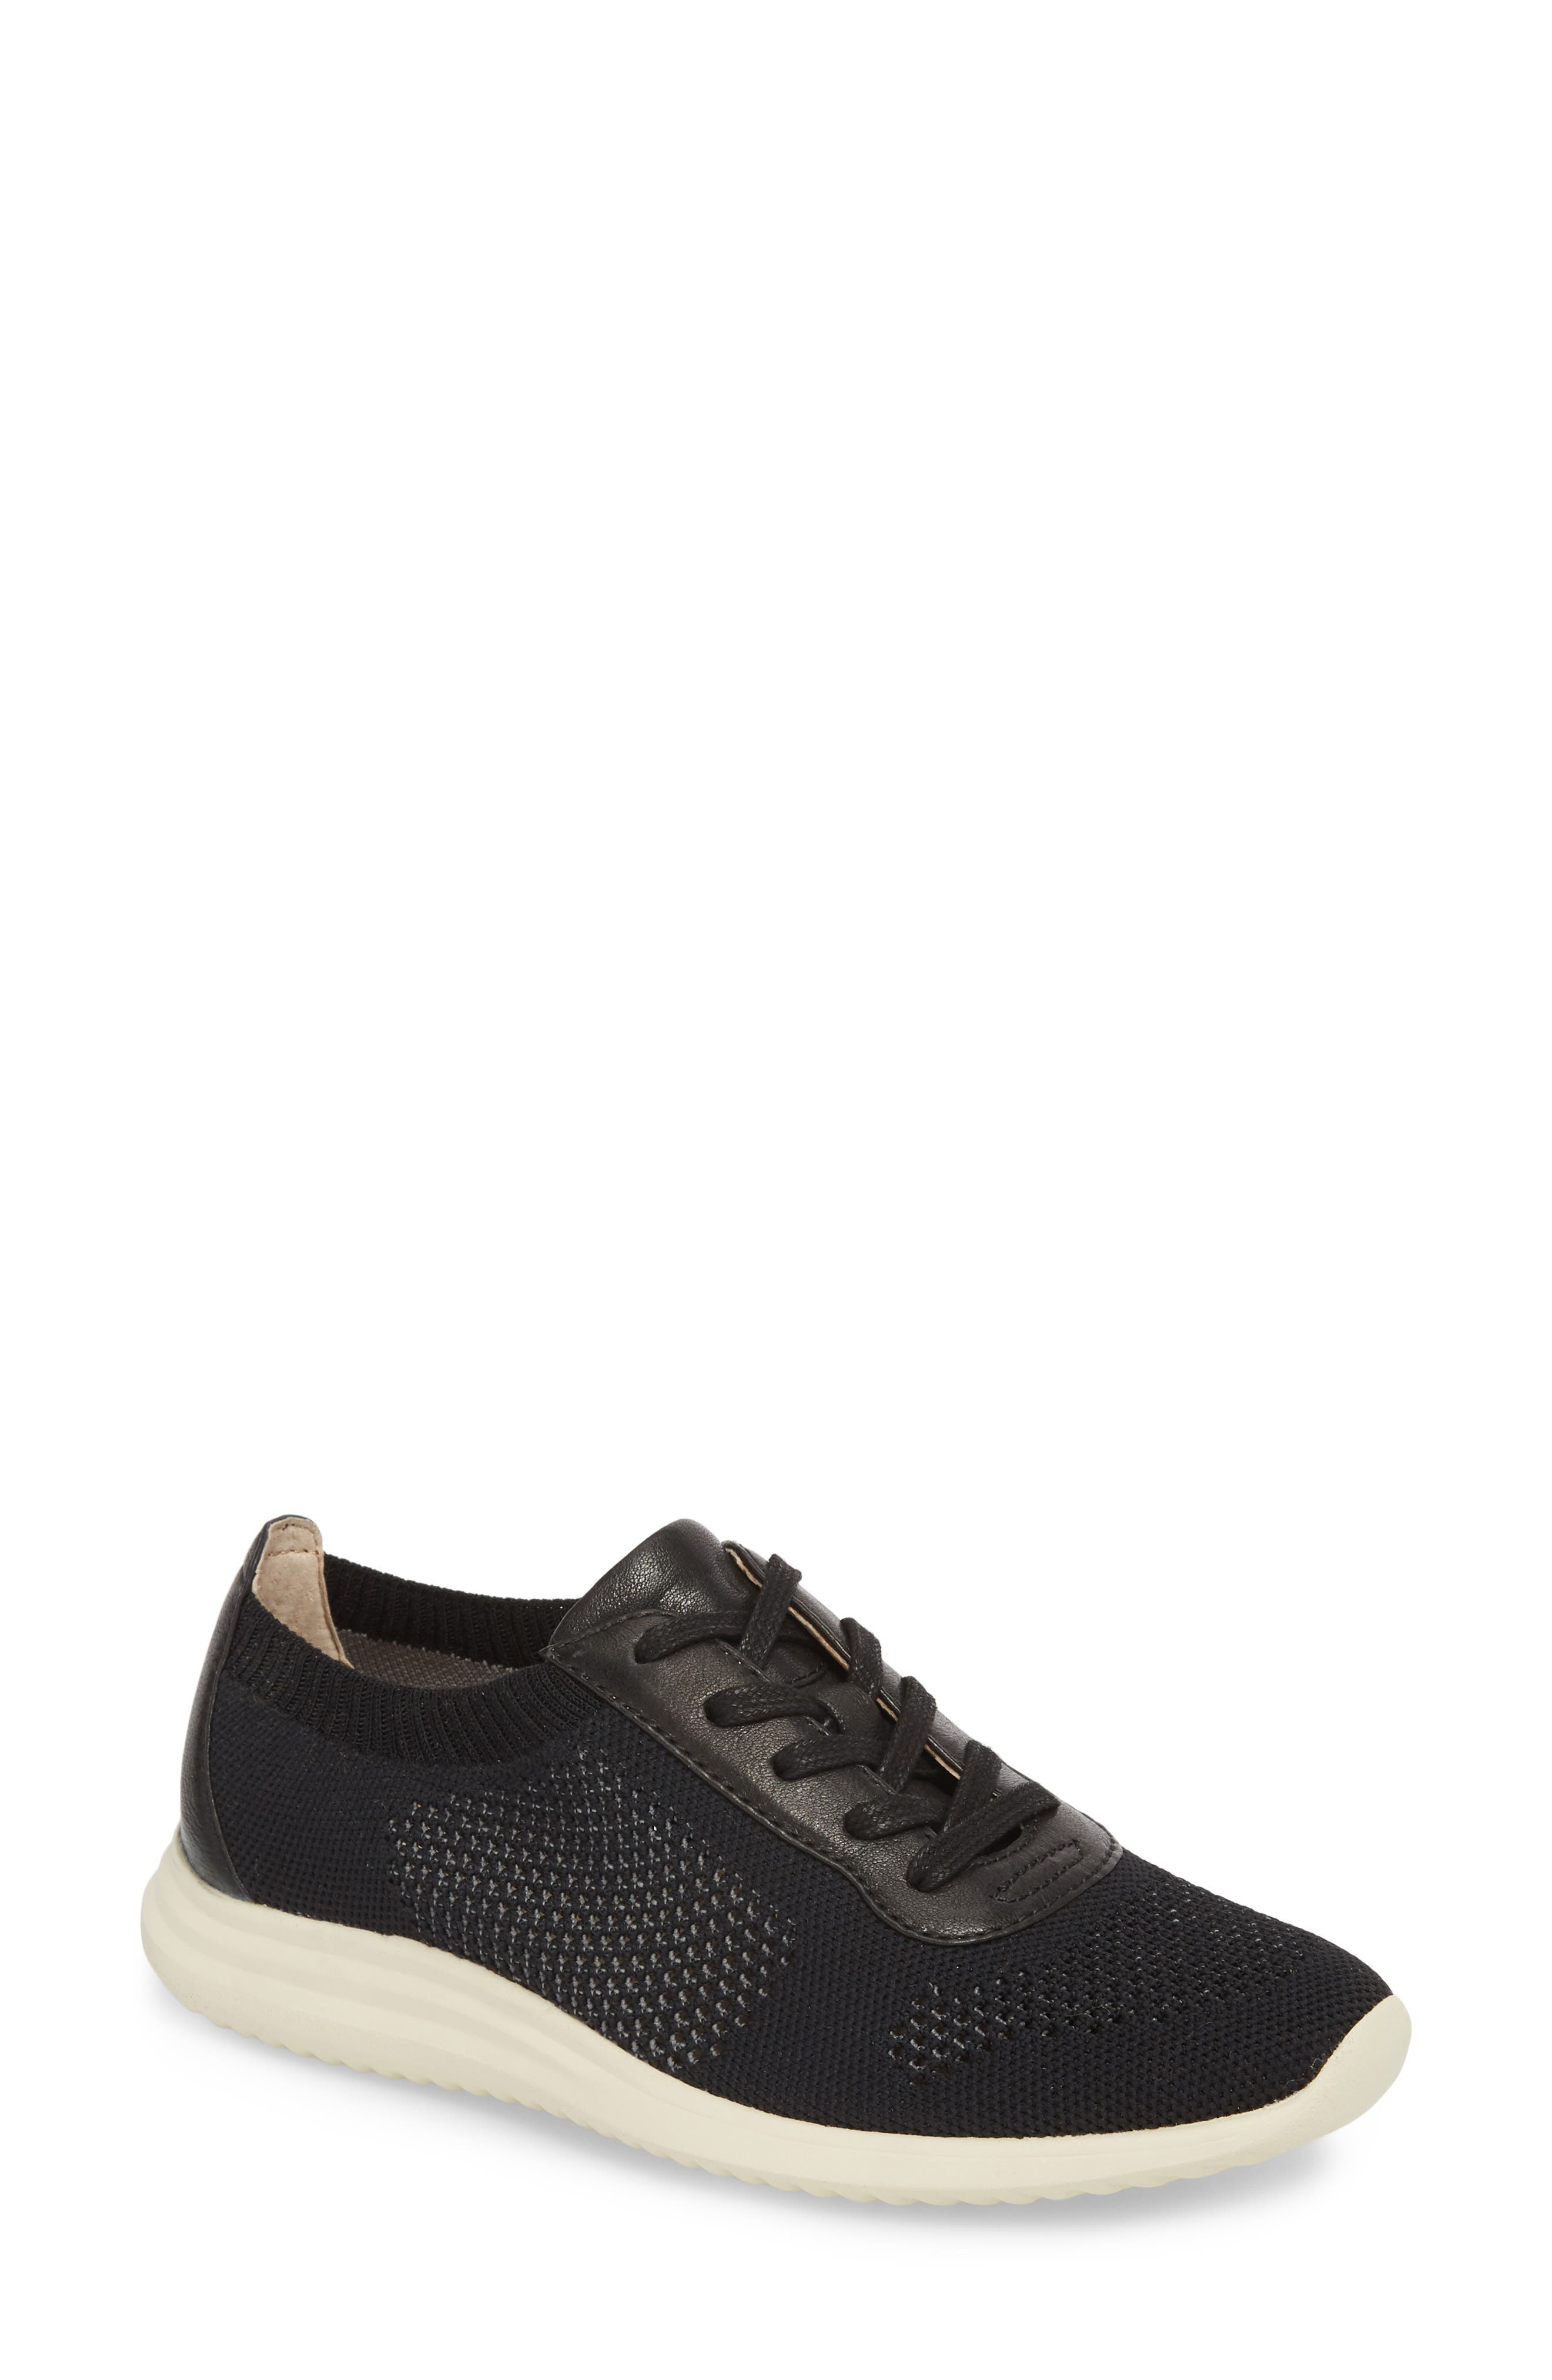 Novella Sneaker,                             Main thumbnail 1, color,                             Black Fabric